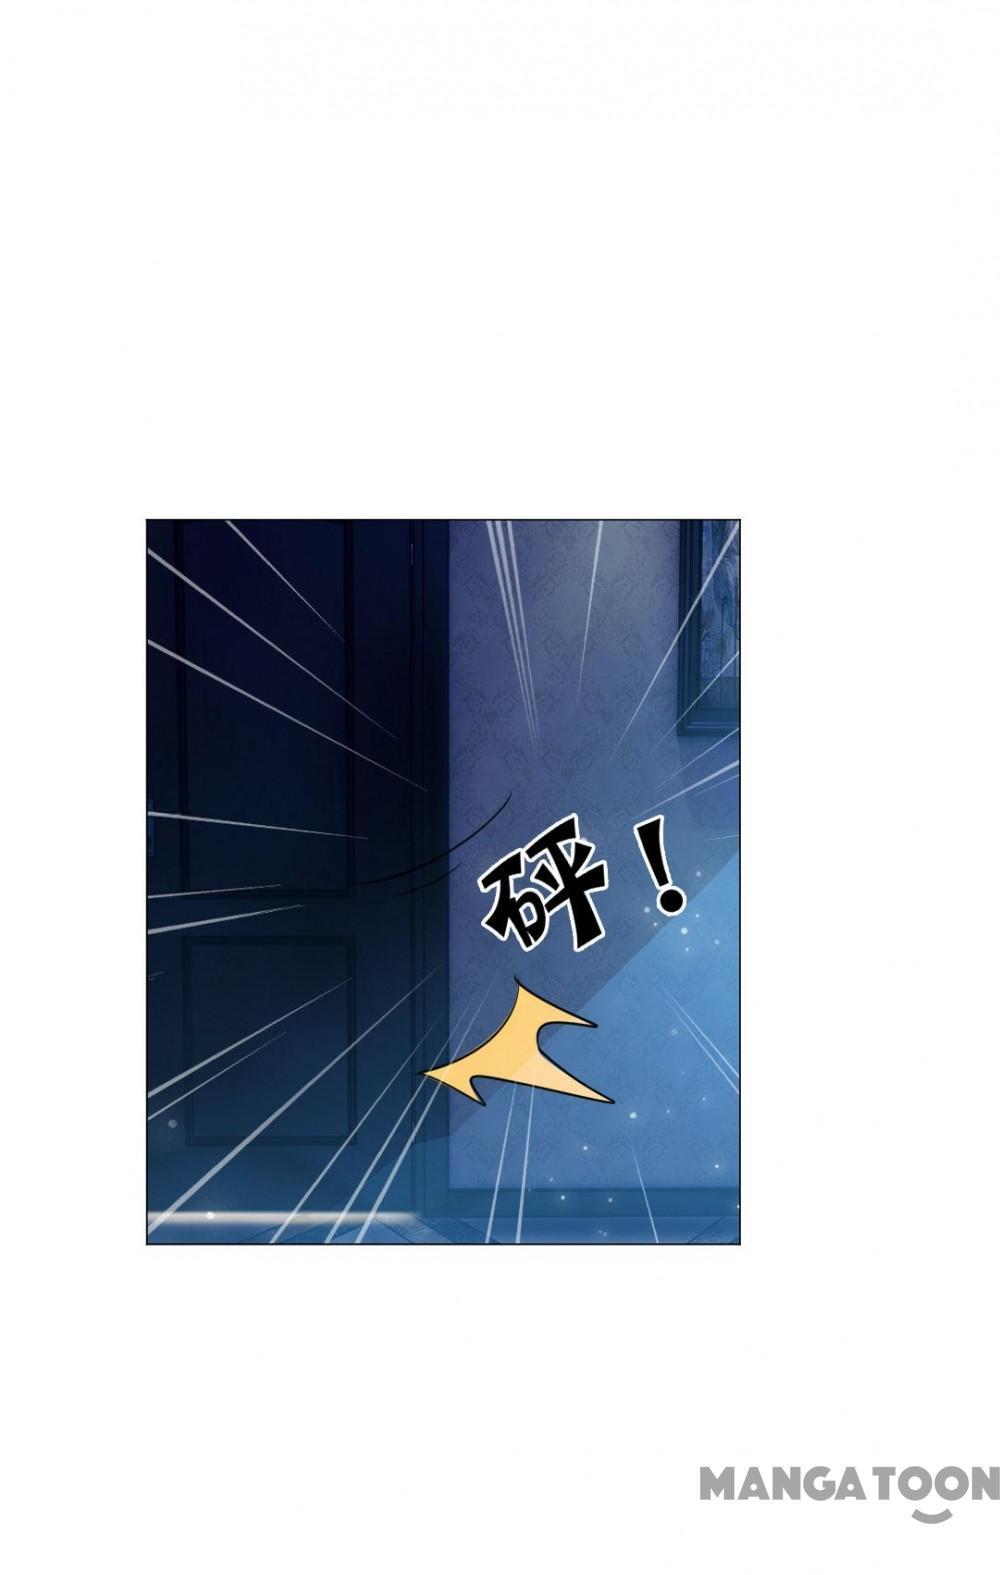 https://img2.nineanime.com/comics/pic2/40/27112/616426/eb3cee21198139fa6a21866d764cc4b8.jpg Page 1